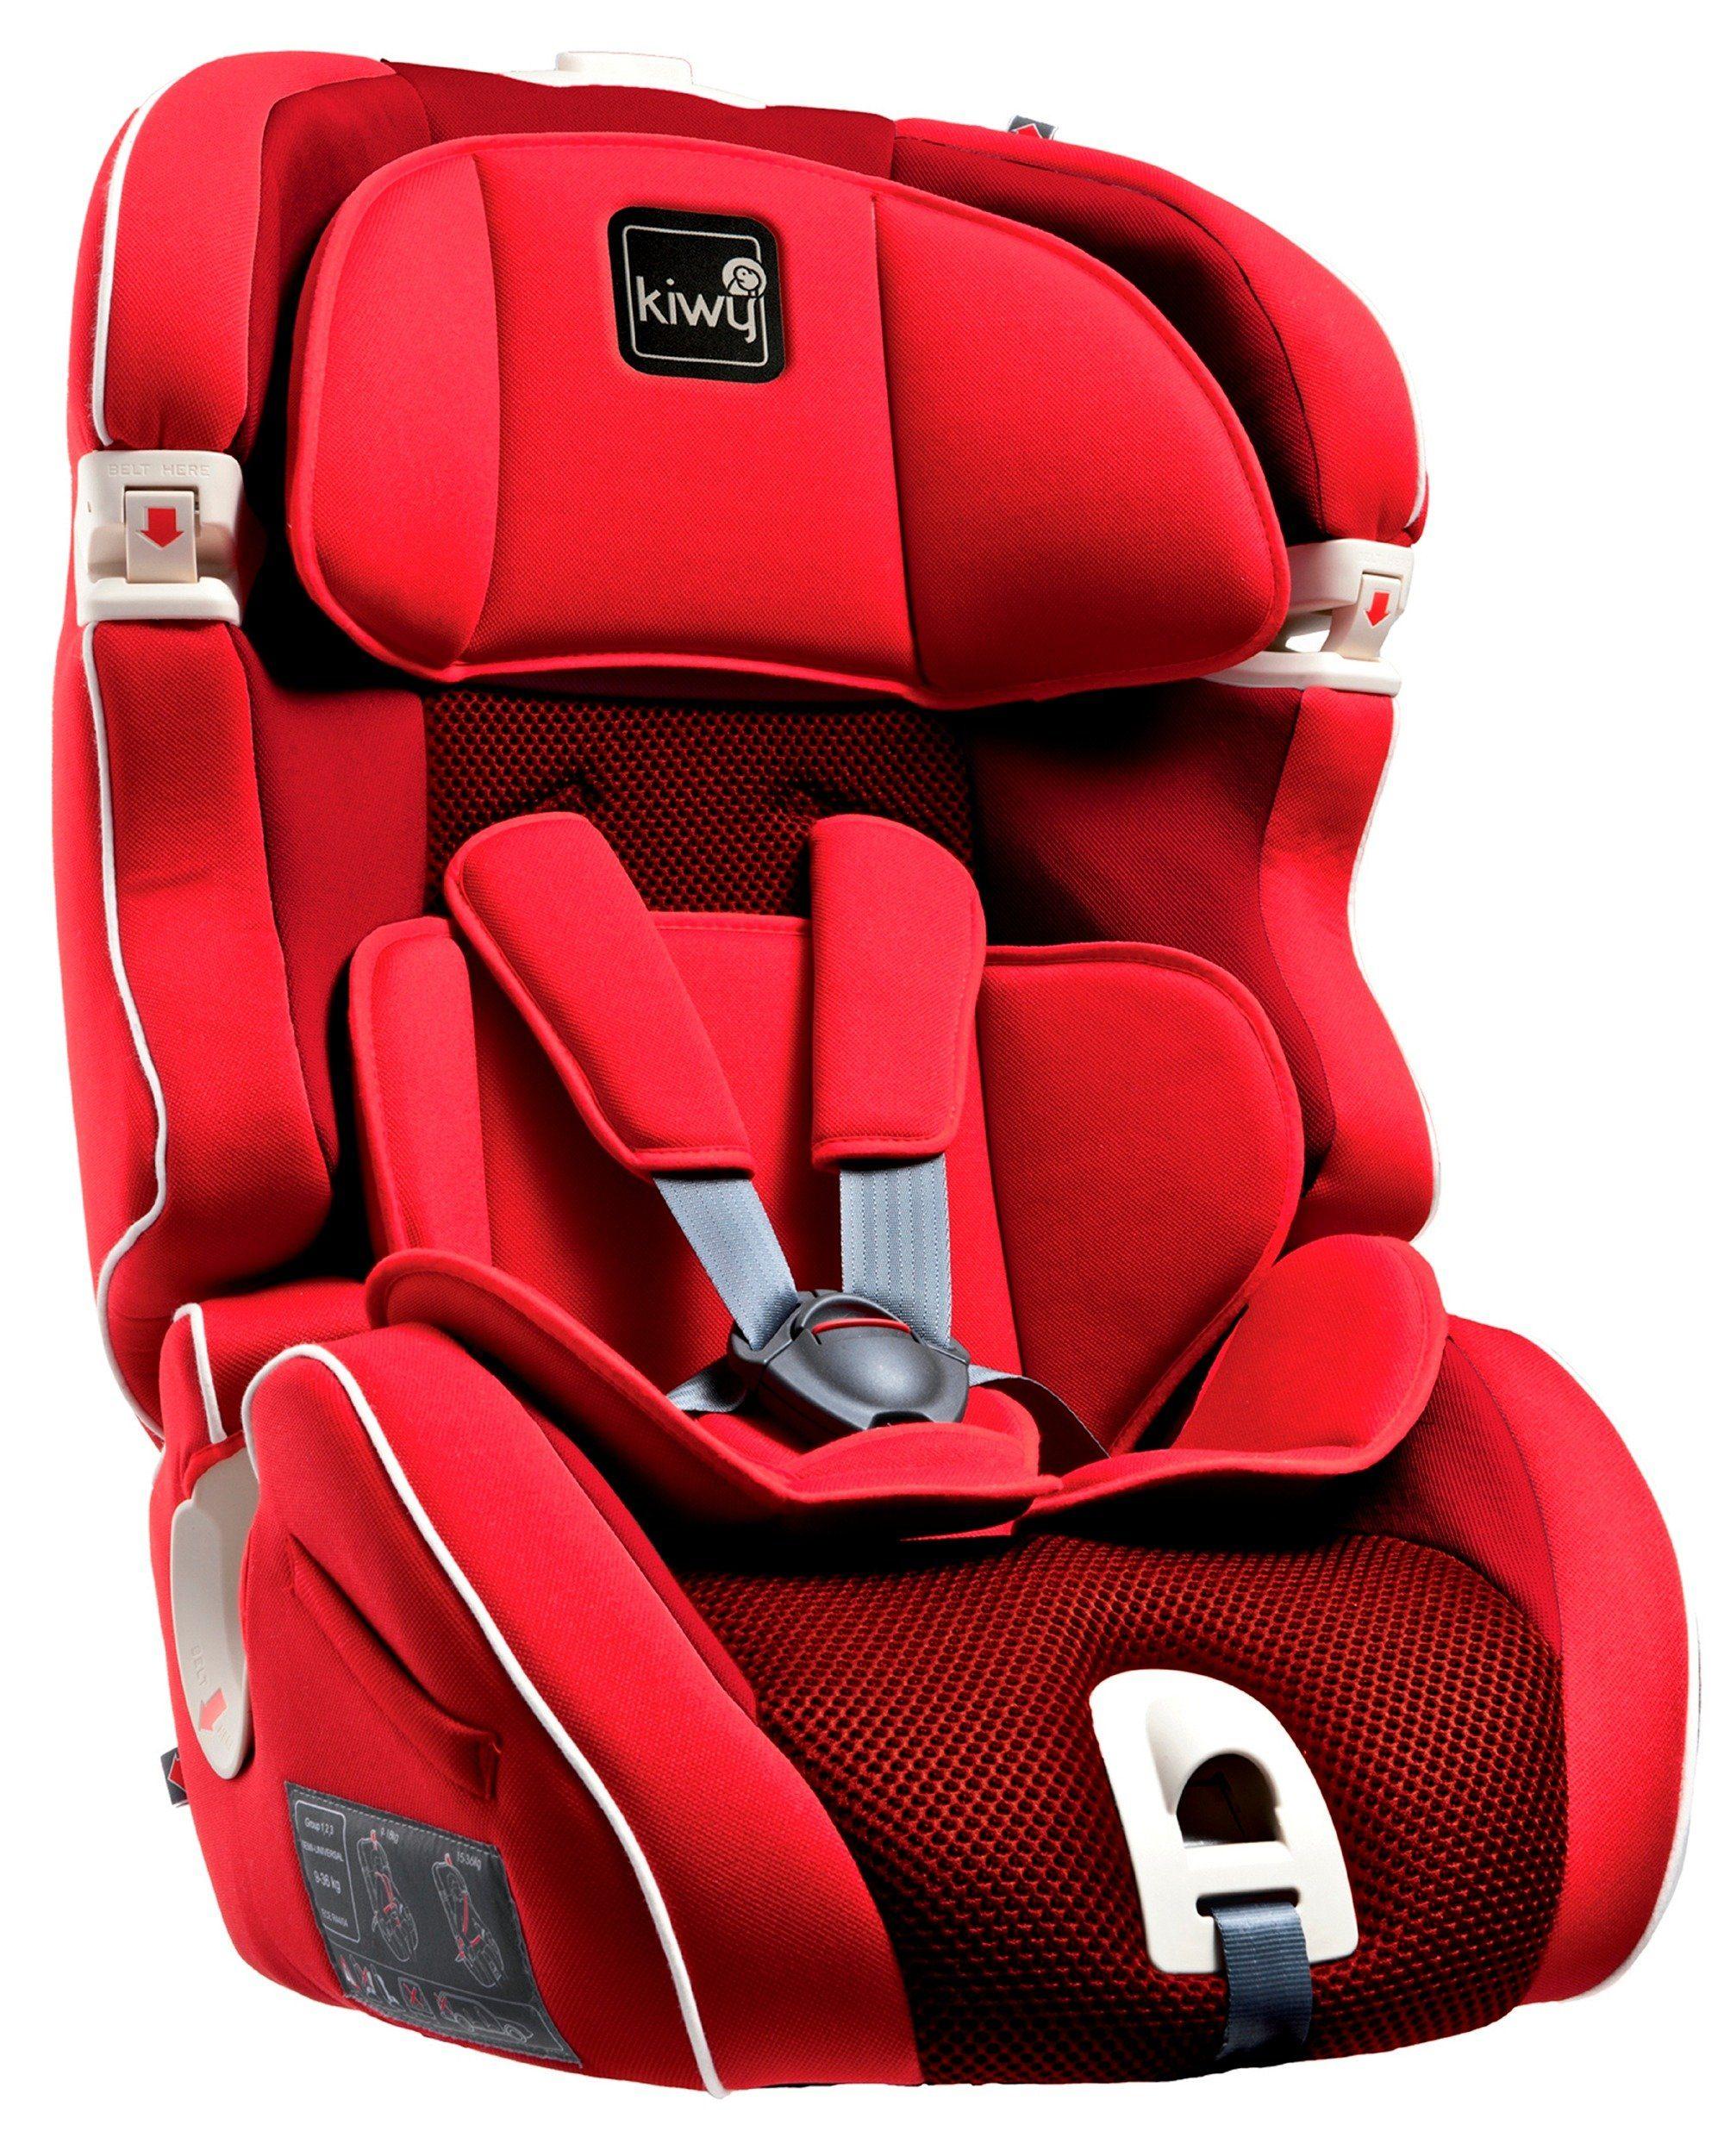 KIWY Kindersitz »SL123 Universal«, 9 - 36 kg